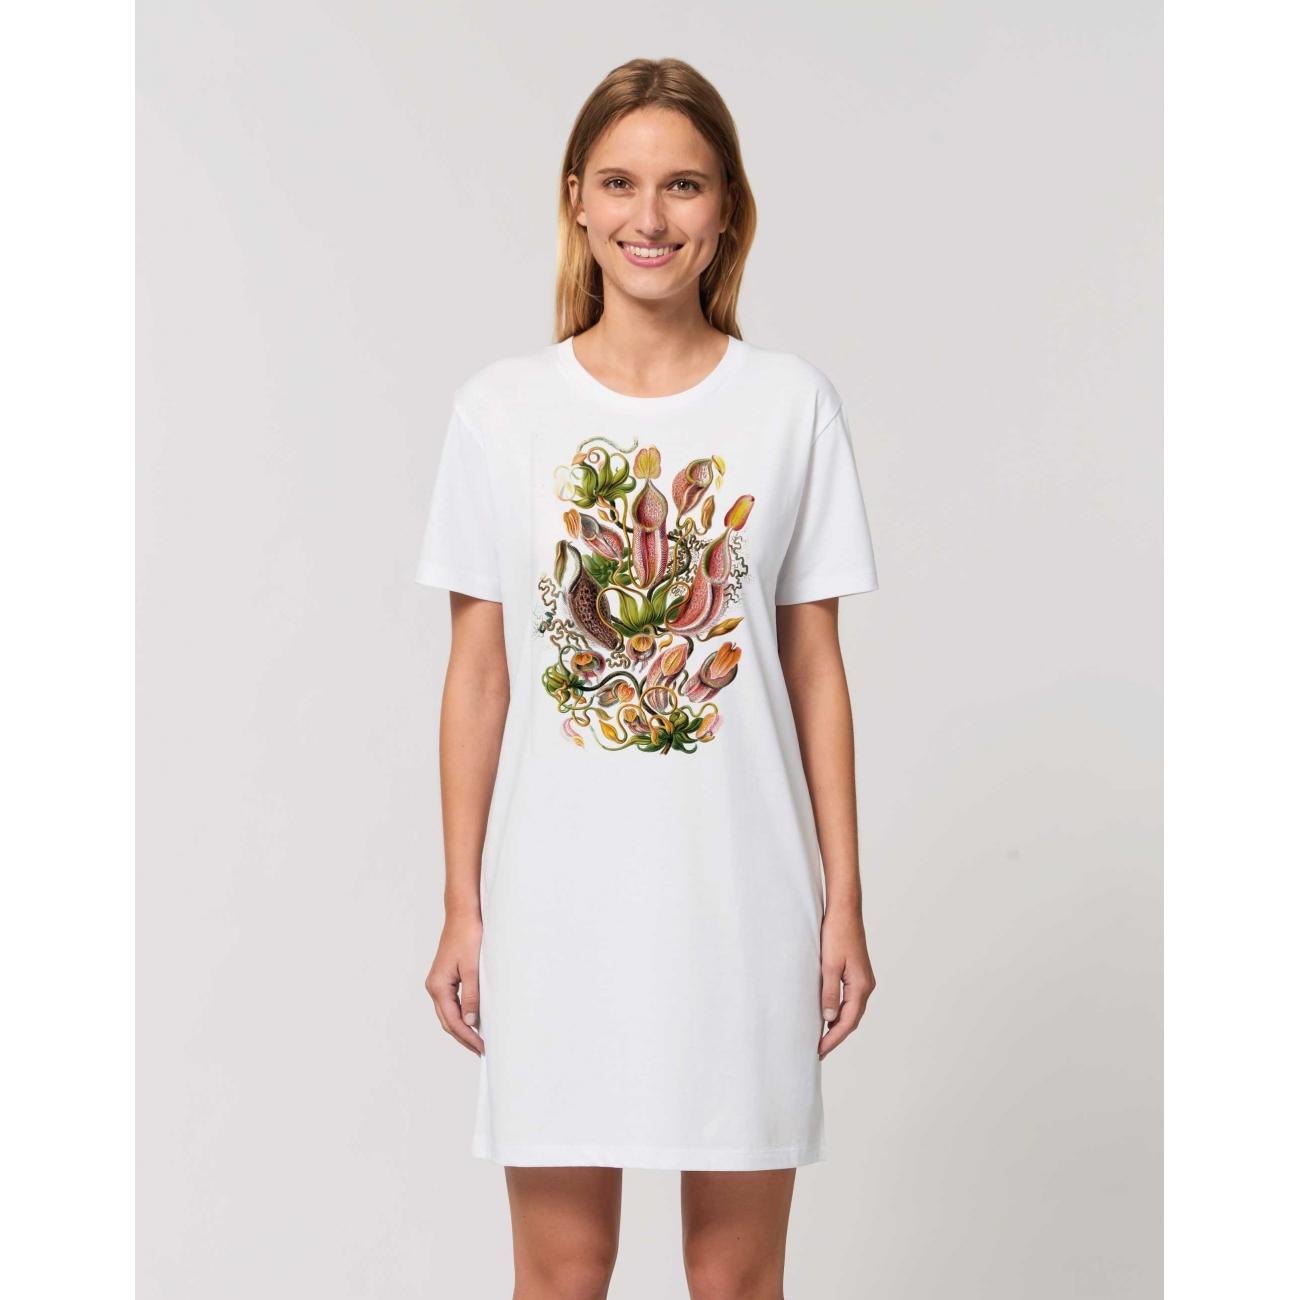 https://tee-shirt-bio.com/9527-thickbox_default/robe-tee-shirt-coton-bio-blanc-impression-fleur-nepenthes.jpg